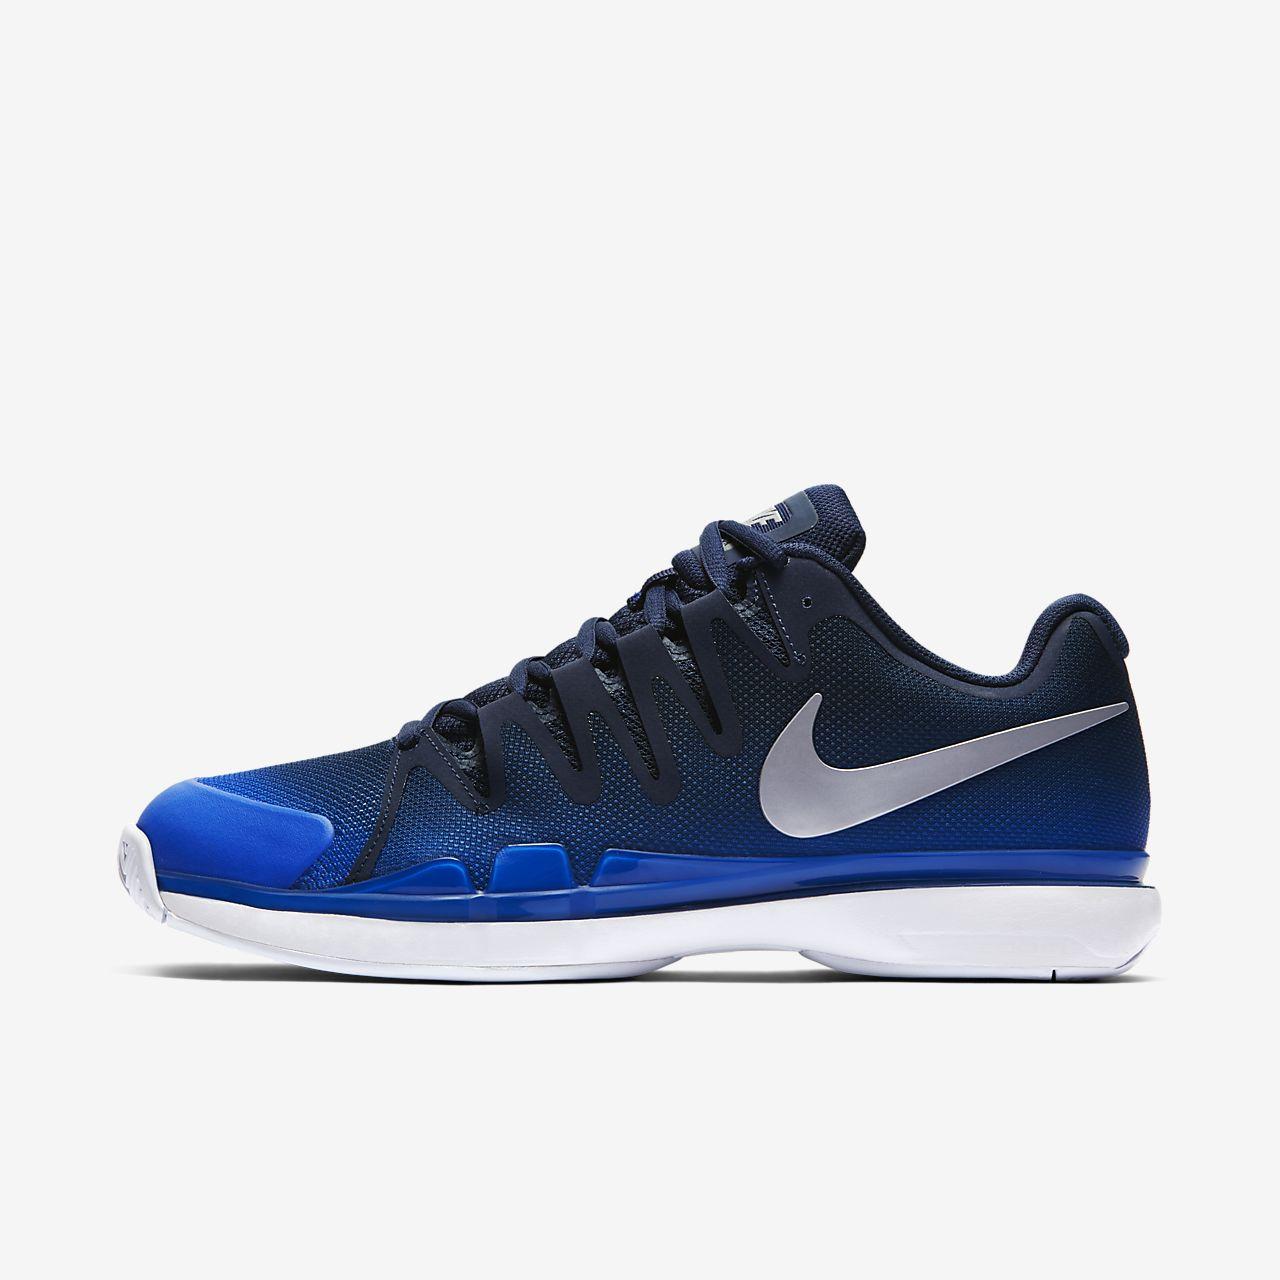 Nike Zoom Vapor 9.5 Tour 男子网球鞋